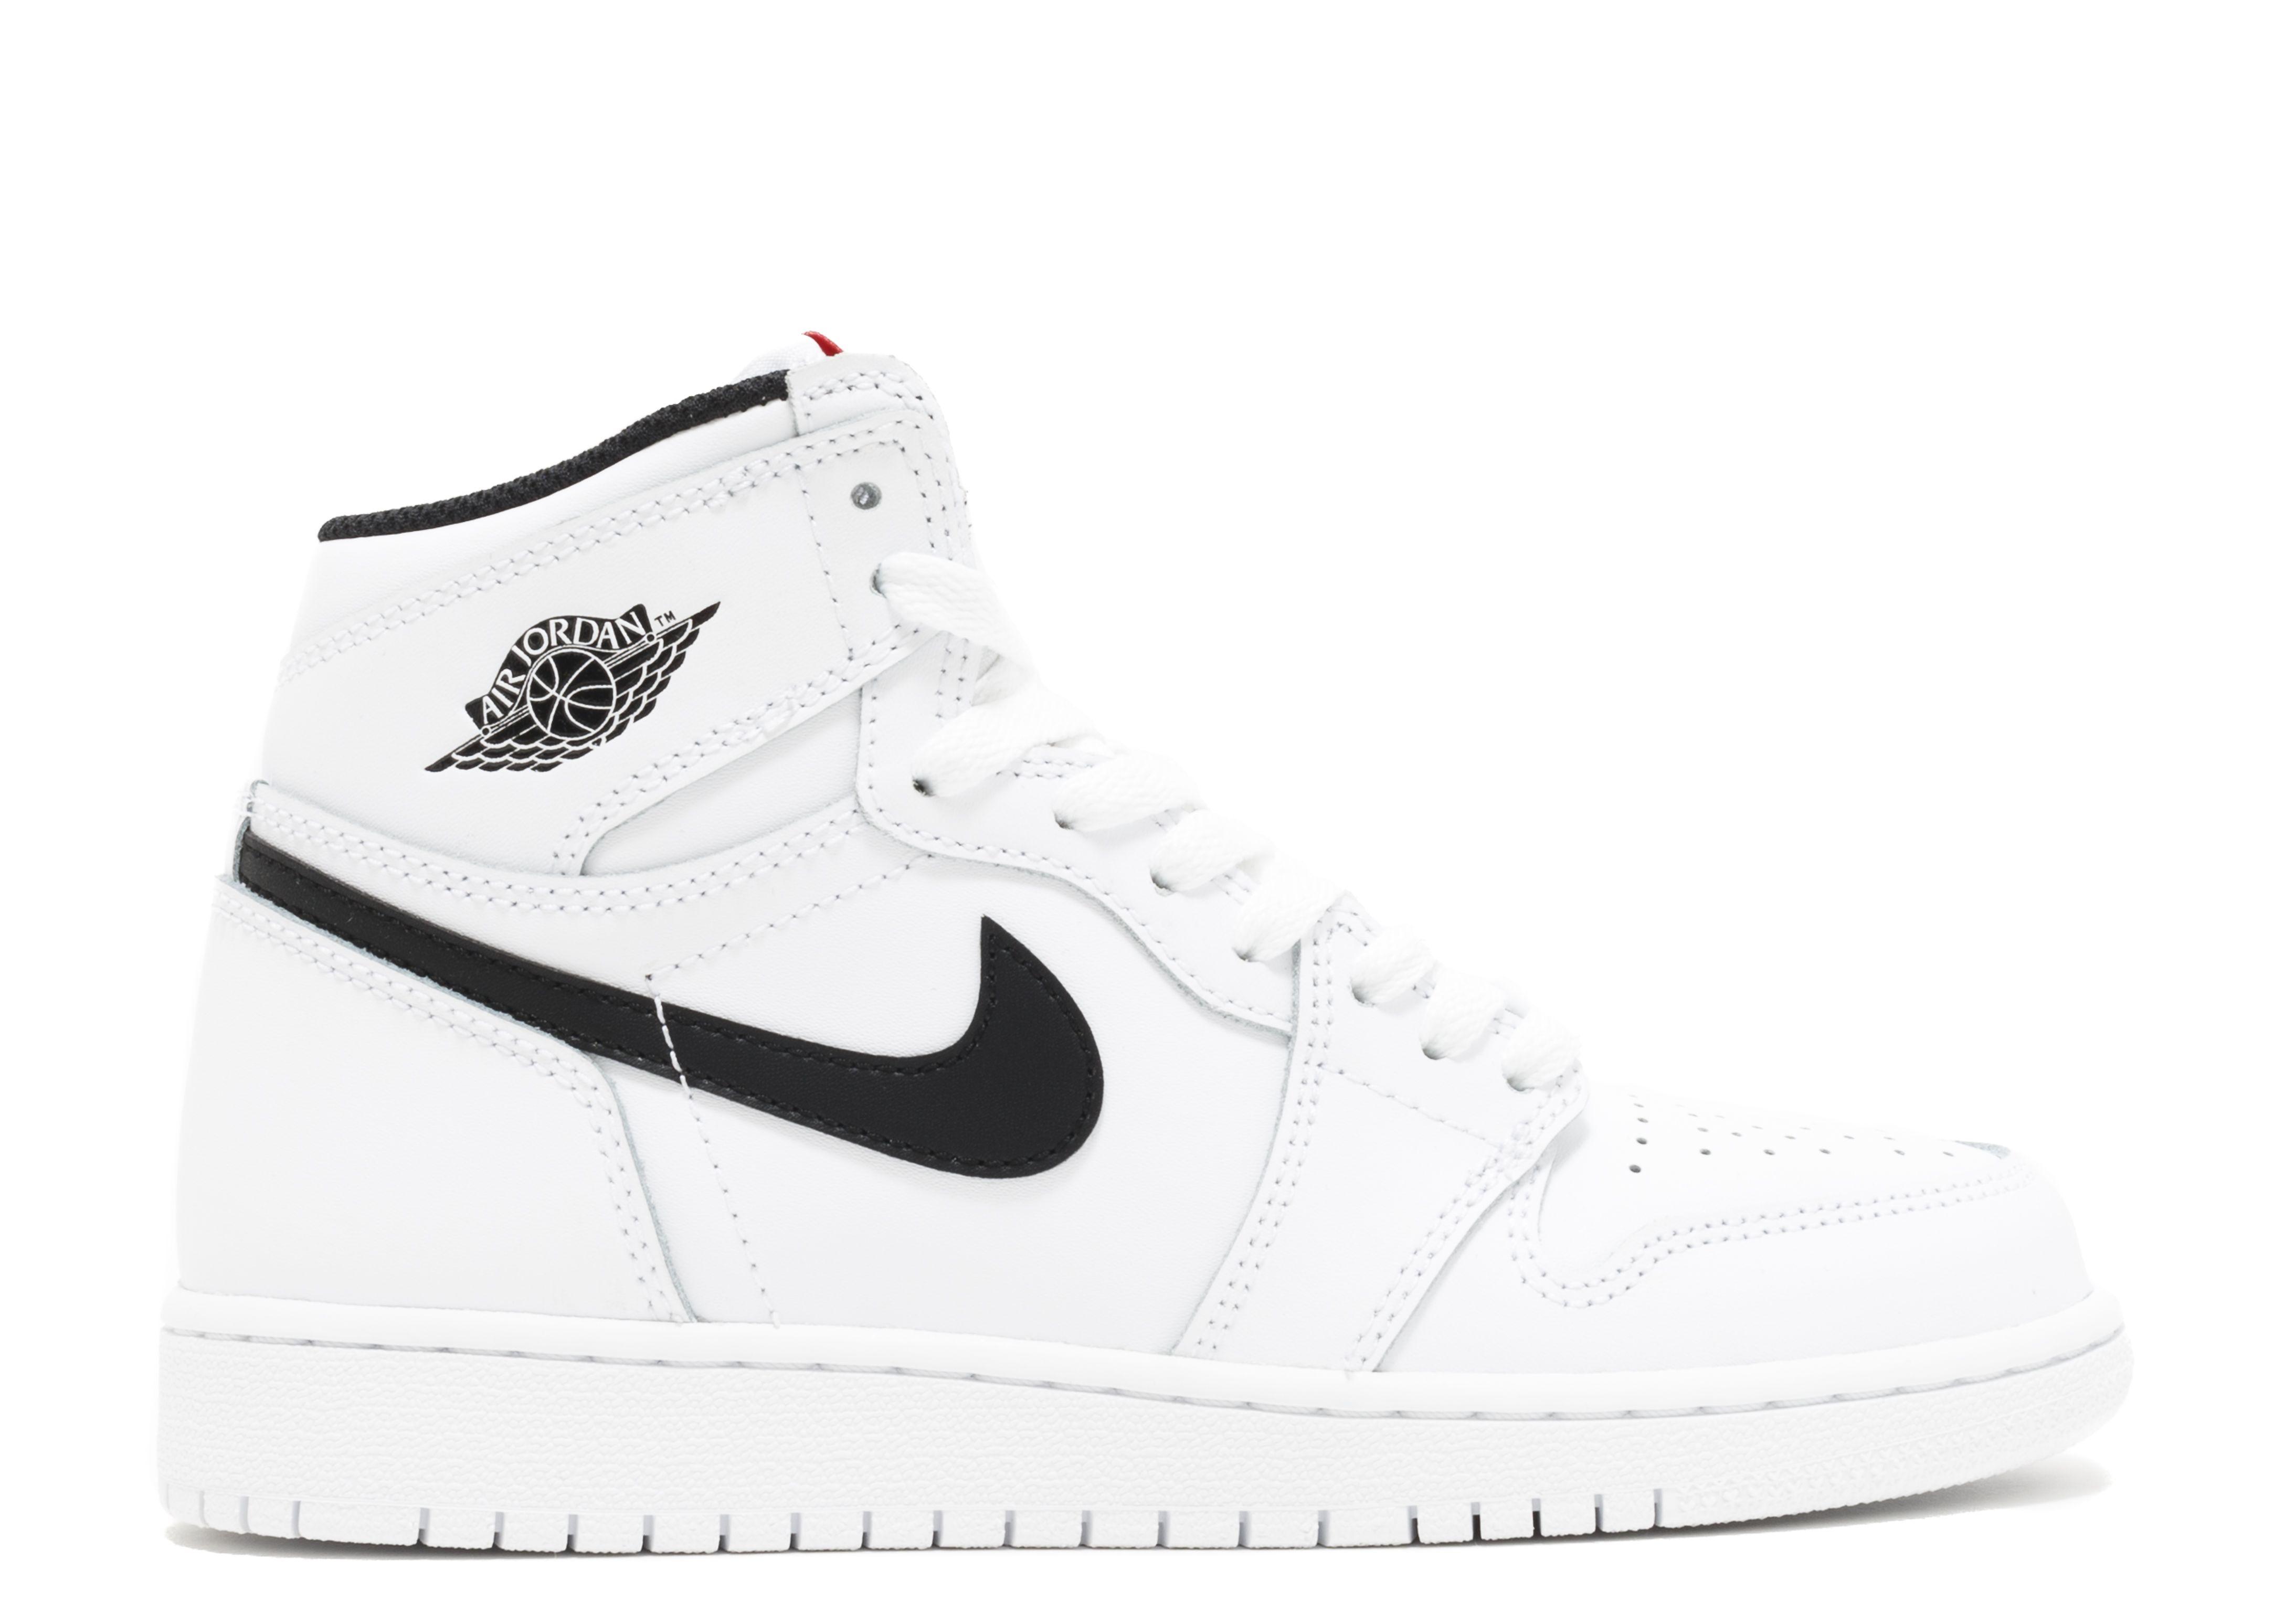 online store e9bfb cfa24 New Jordans Shoes, Nike Air Jordans, Air Jordan Shoes, Jordan 1, Jordan